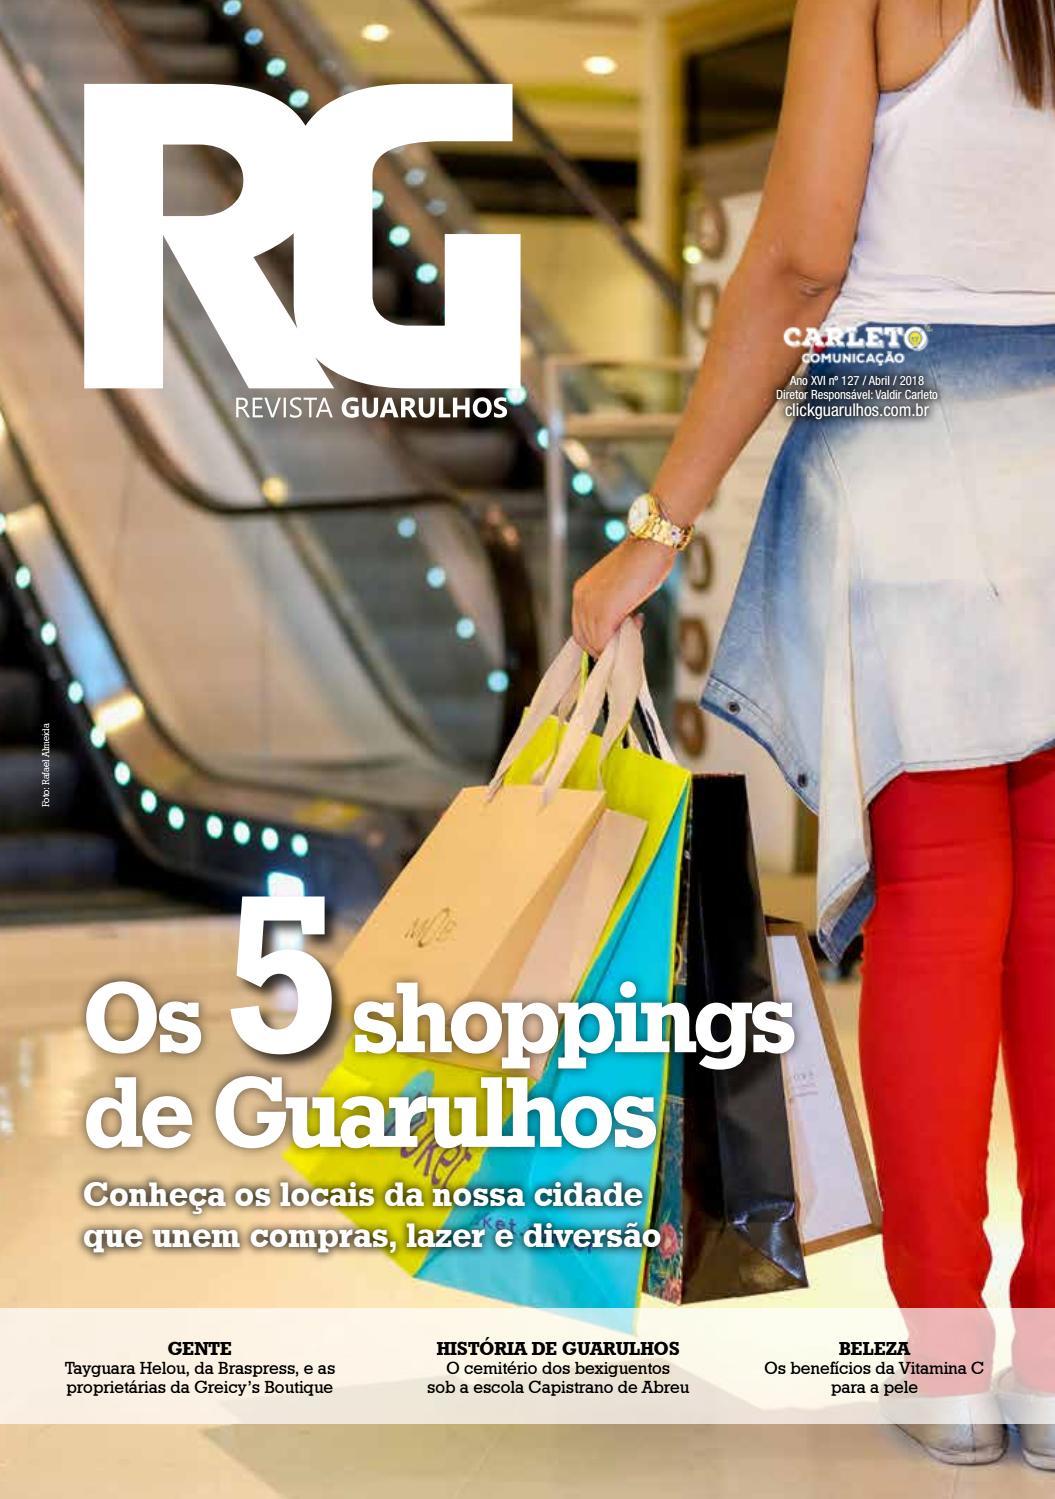 76bebf1df Revista Guarulhos - Edição 127 by Carleto Editorial - issuu